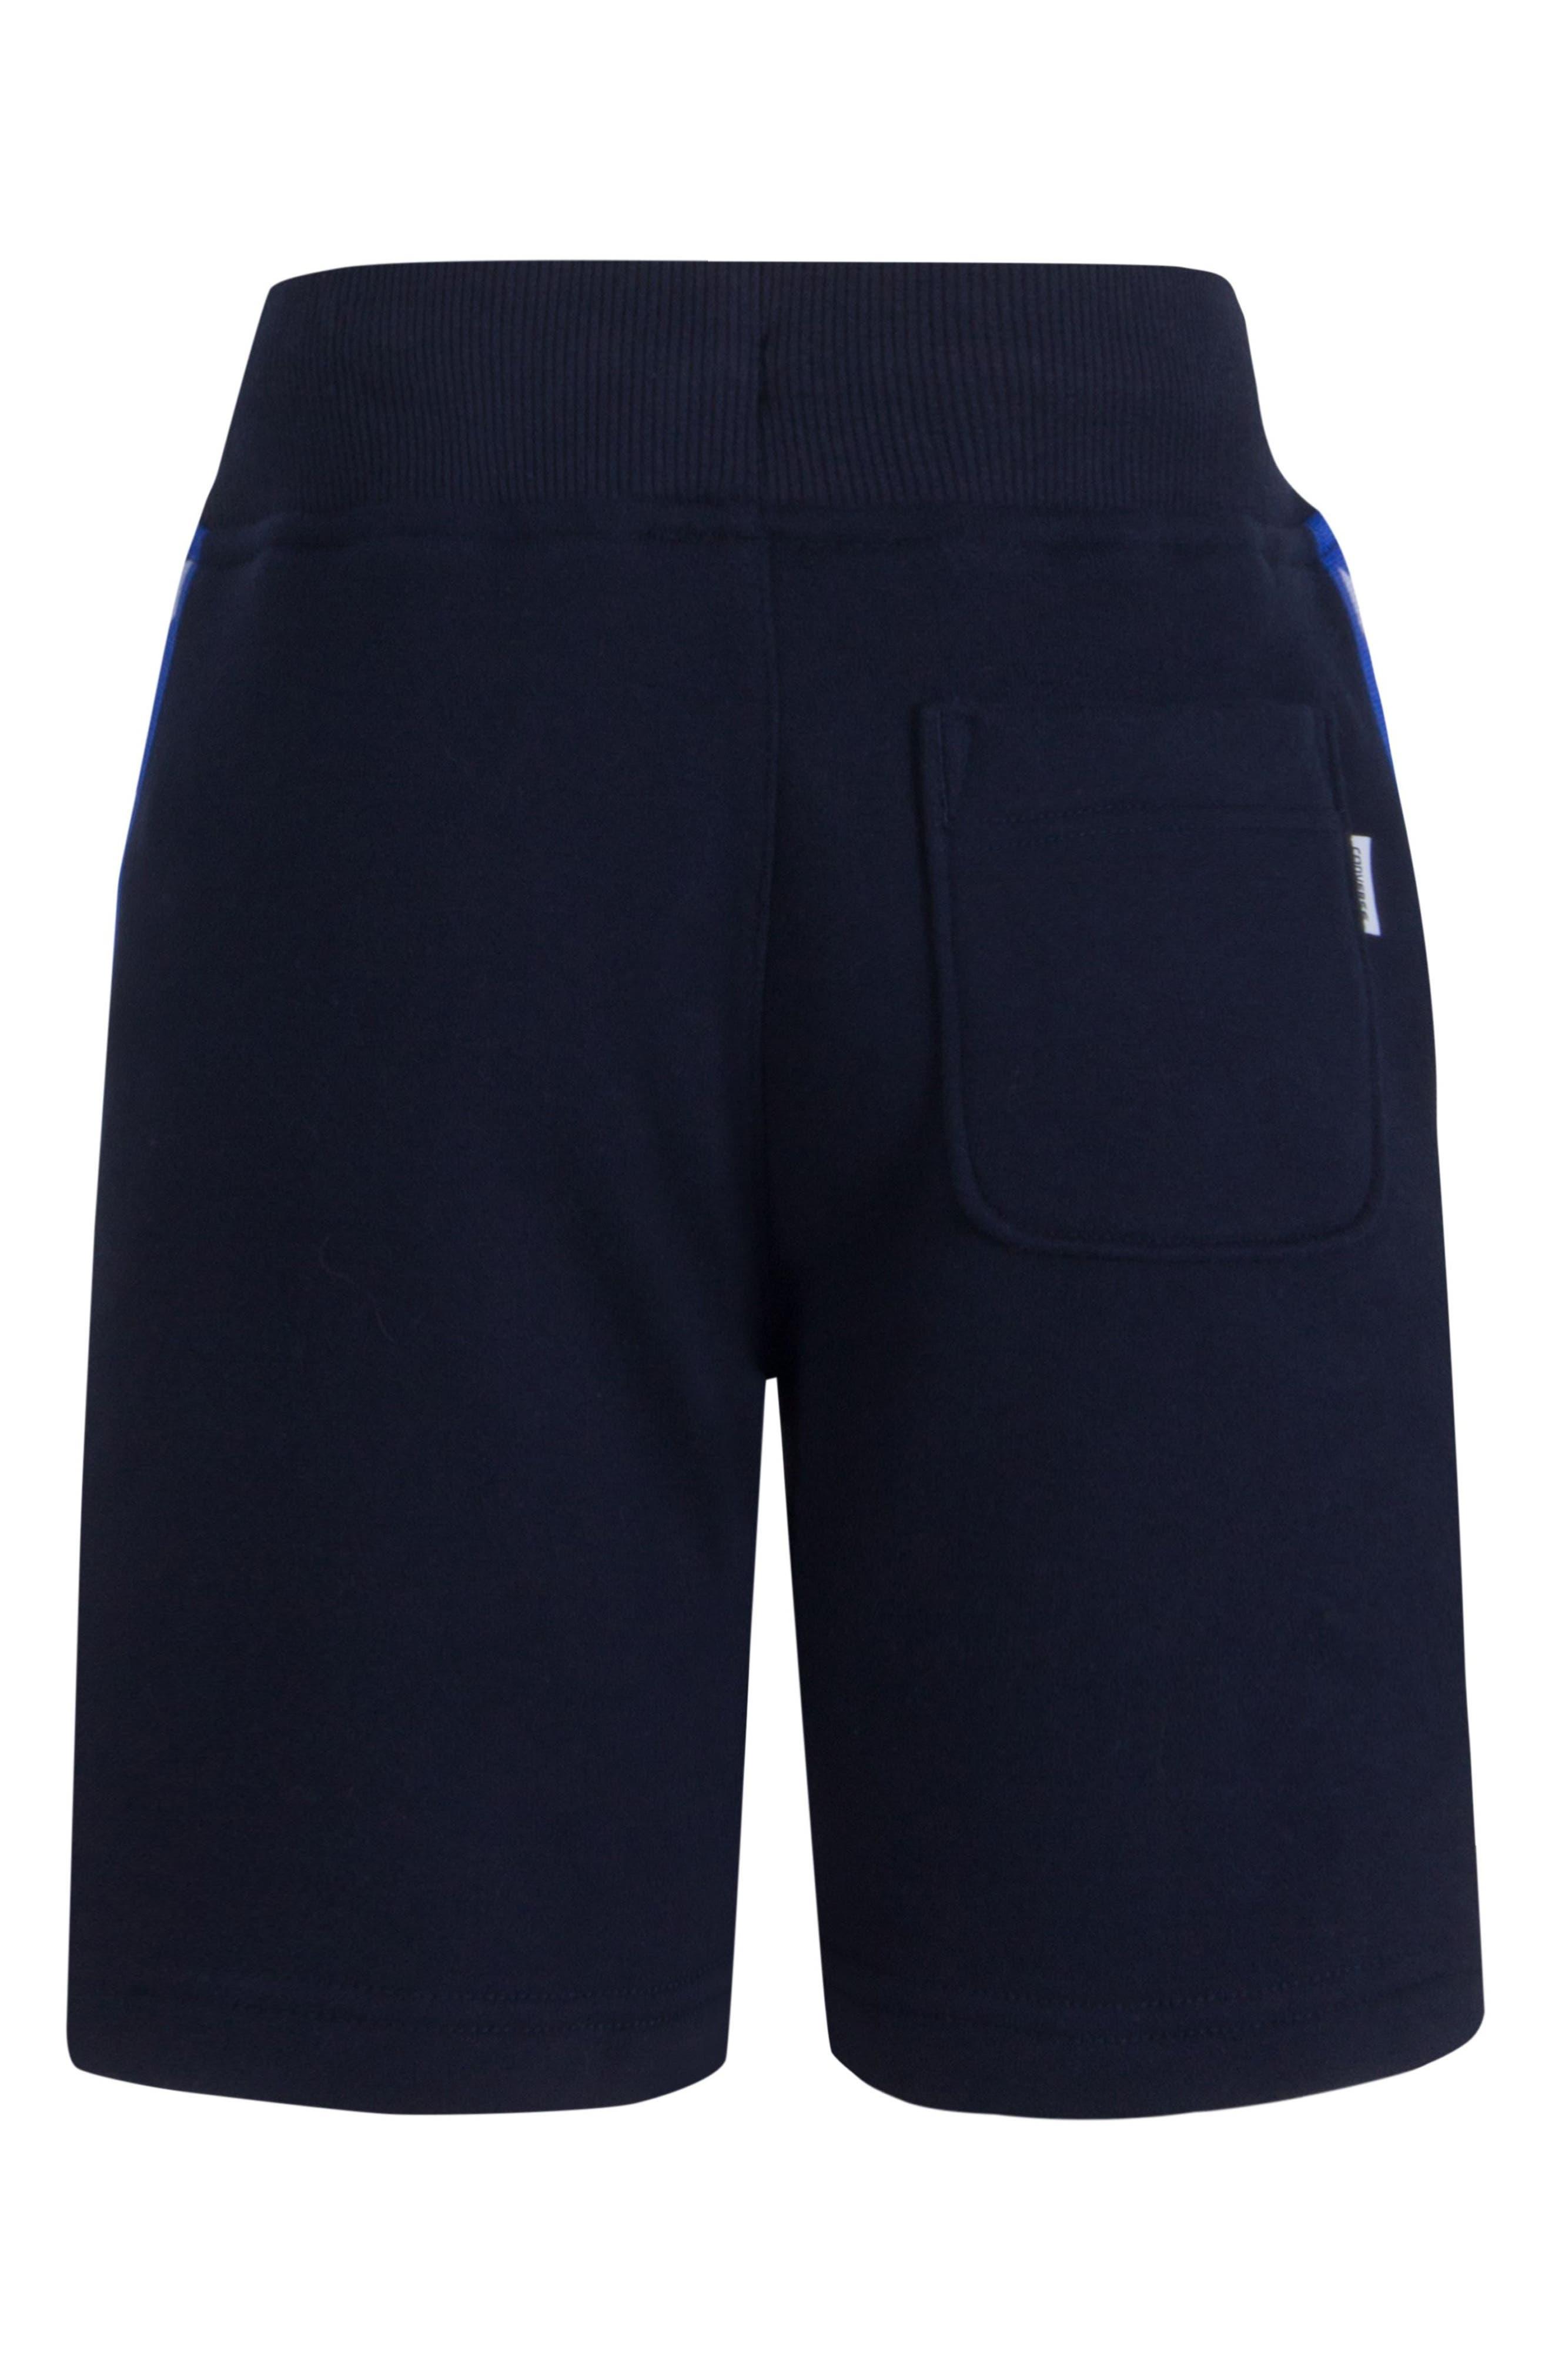 Star Knit Shorts,                             Alternate thumbnail 2, color,                             418